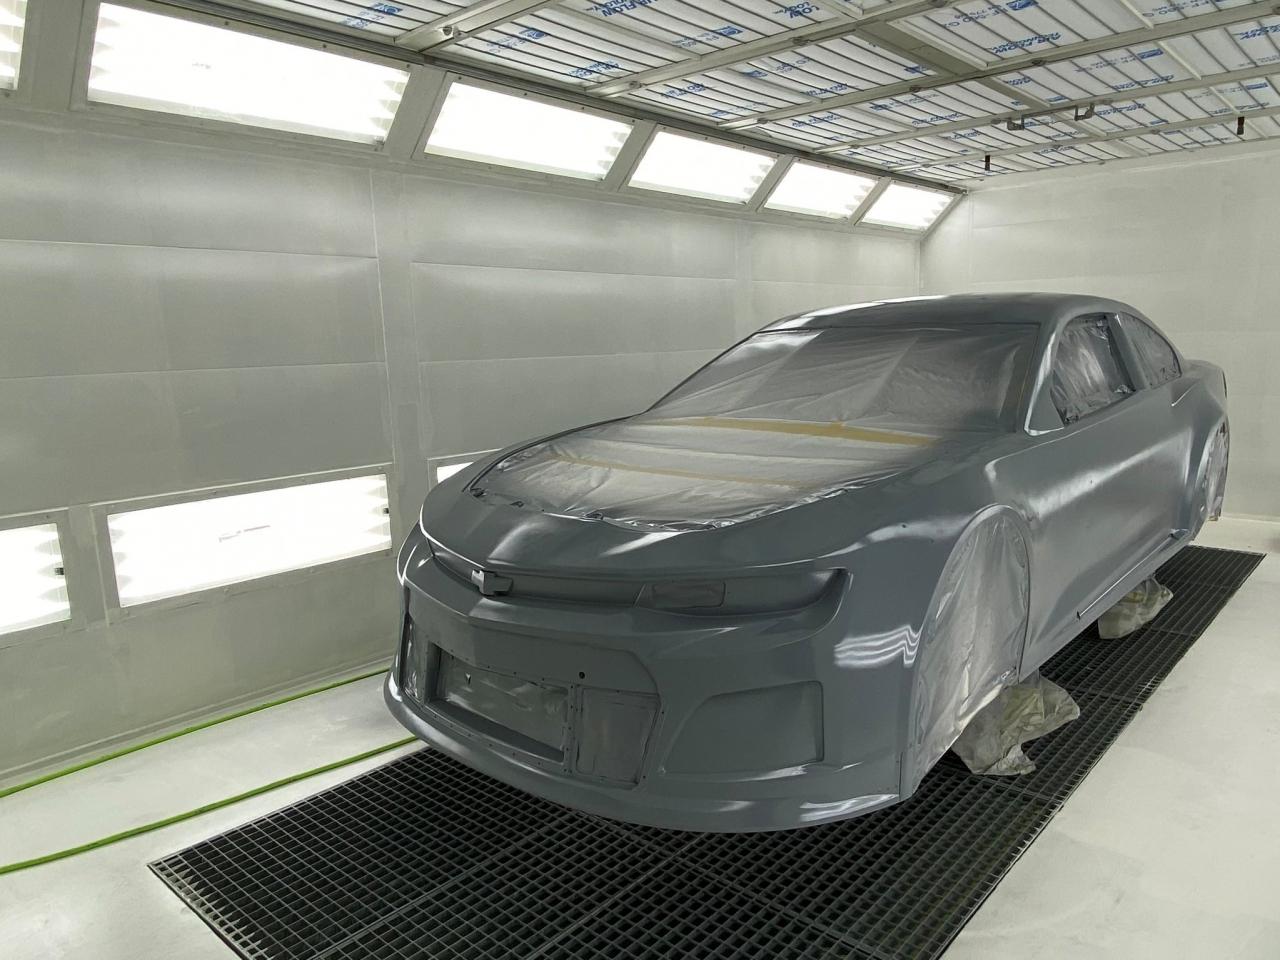 Hendrick Motorsports paint booth